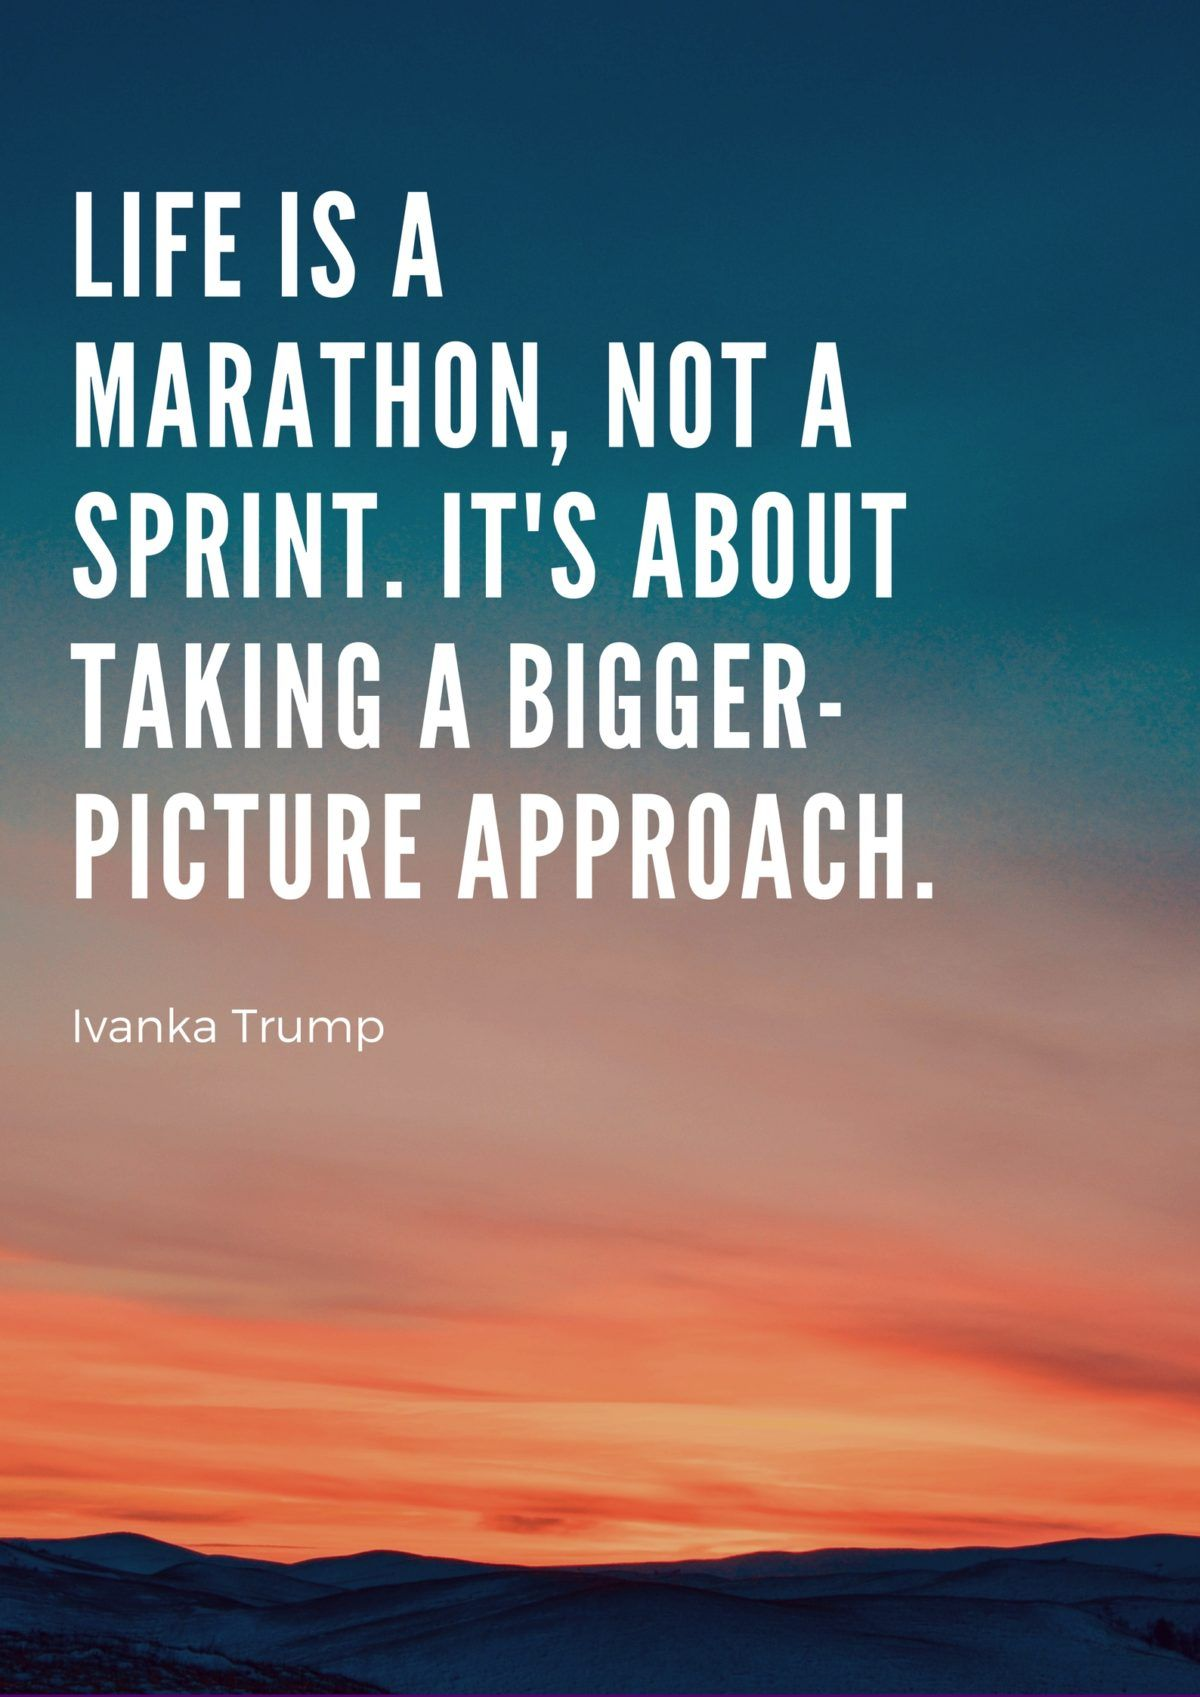 Life is a Marathon not a Sprint